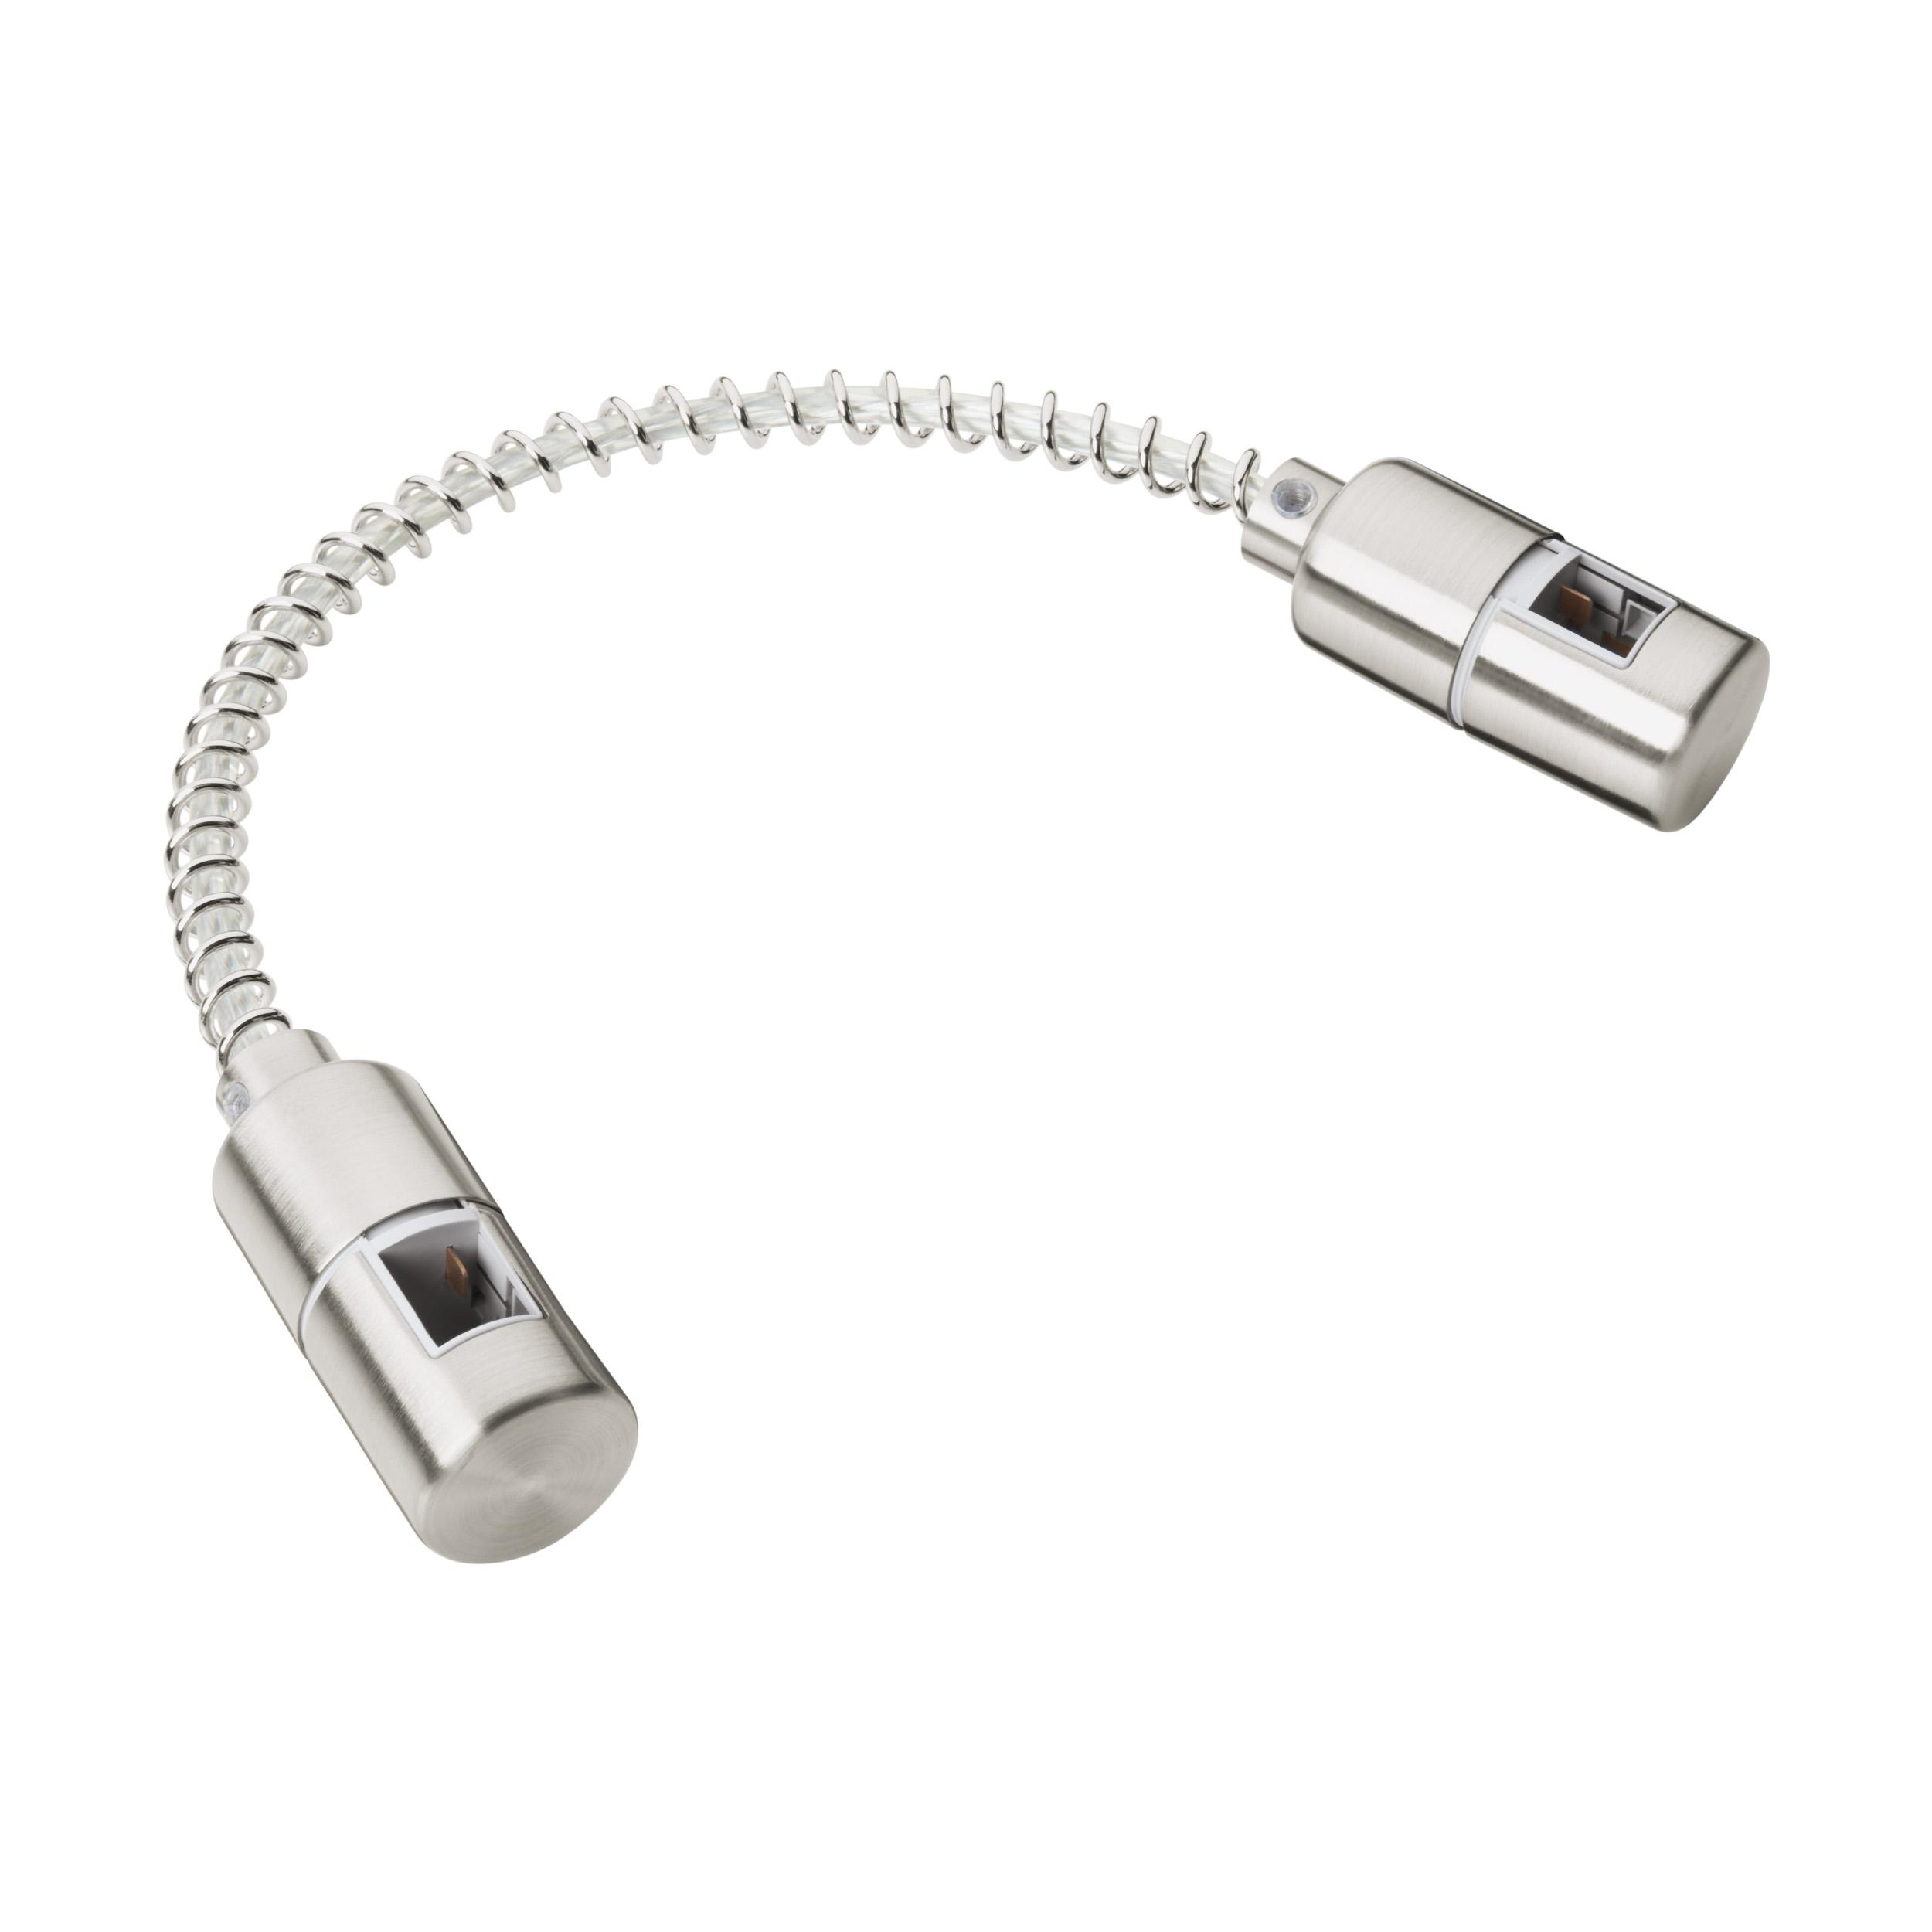 1 Stk Flexverbinder Villanova 1 nickelmatt IP20 LI61339---